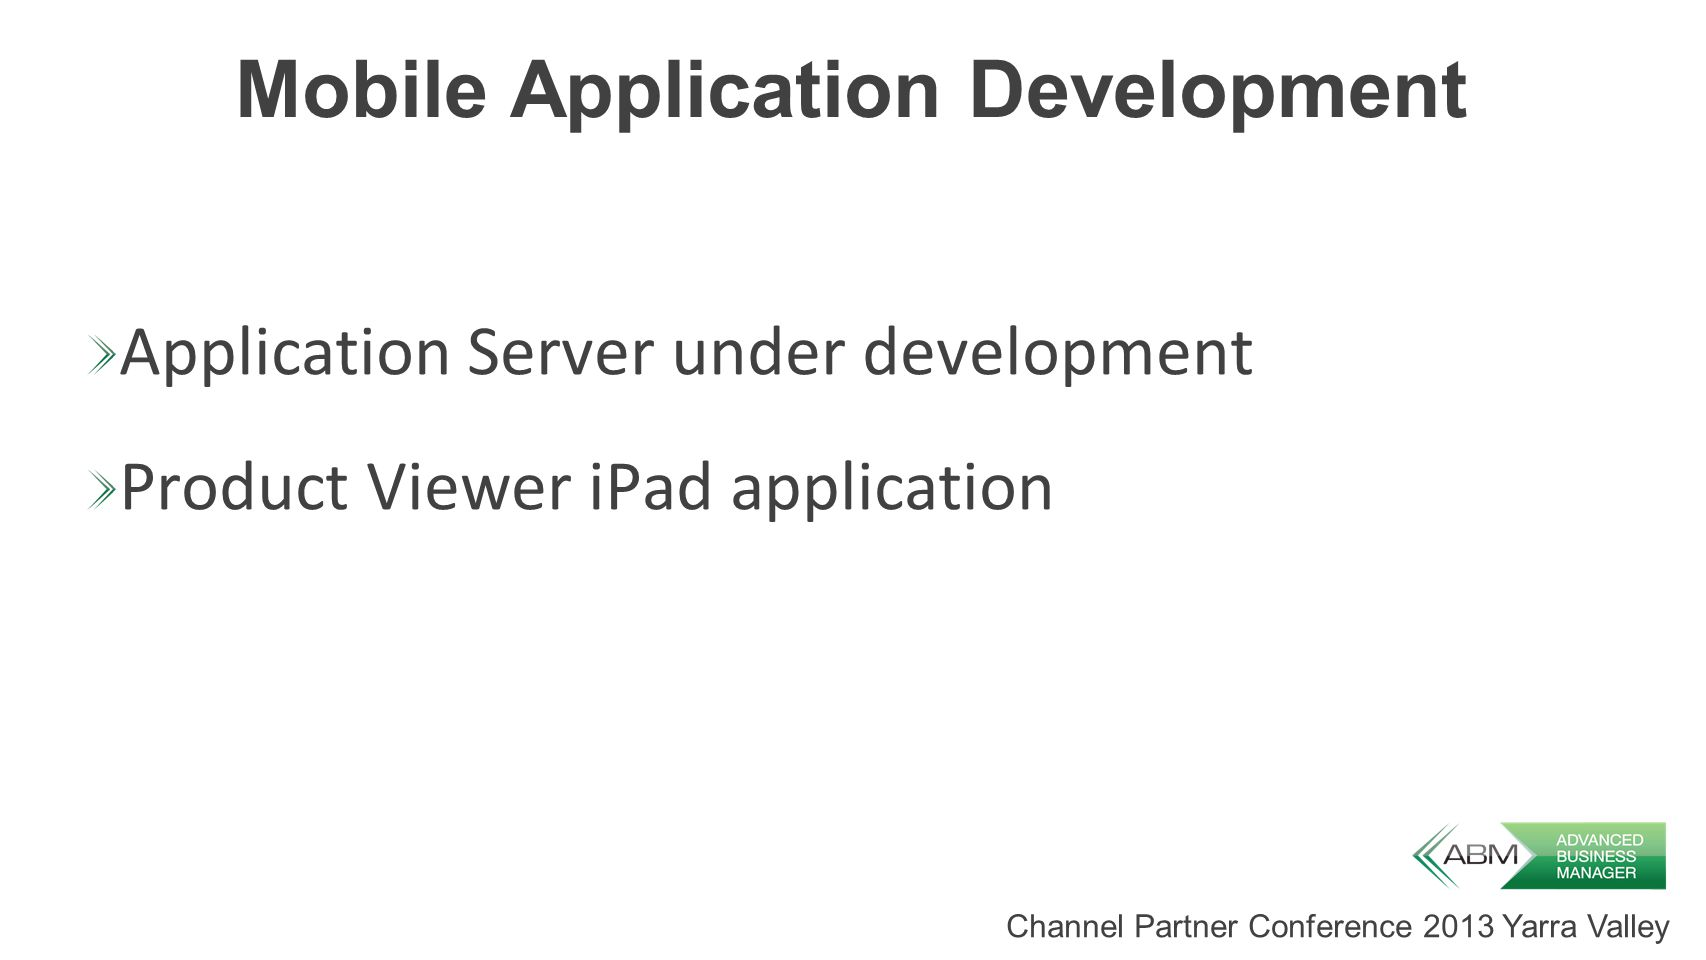 Channel Partner Conference 2013 Yarra Valley Mobile Application Development Application Server under development Product Viewer iPad application